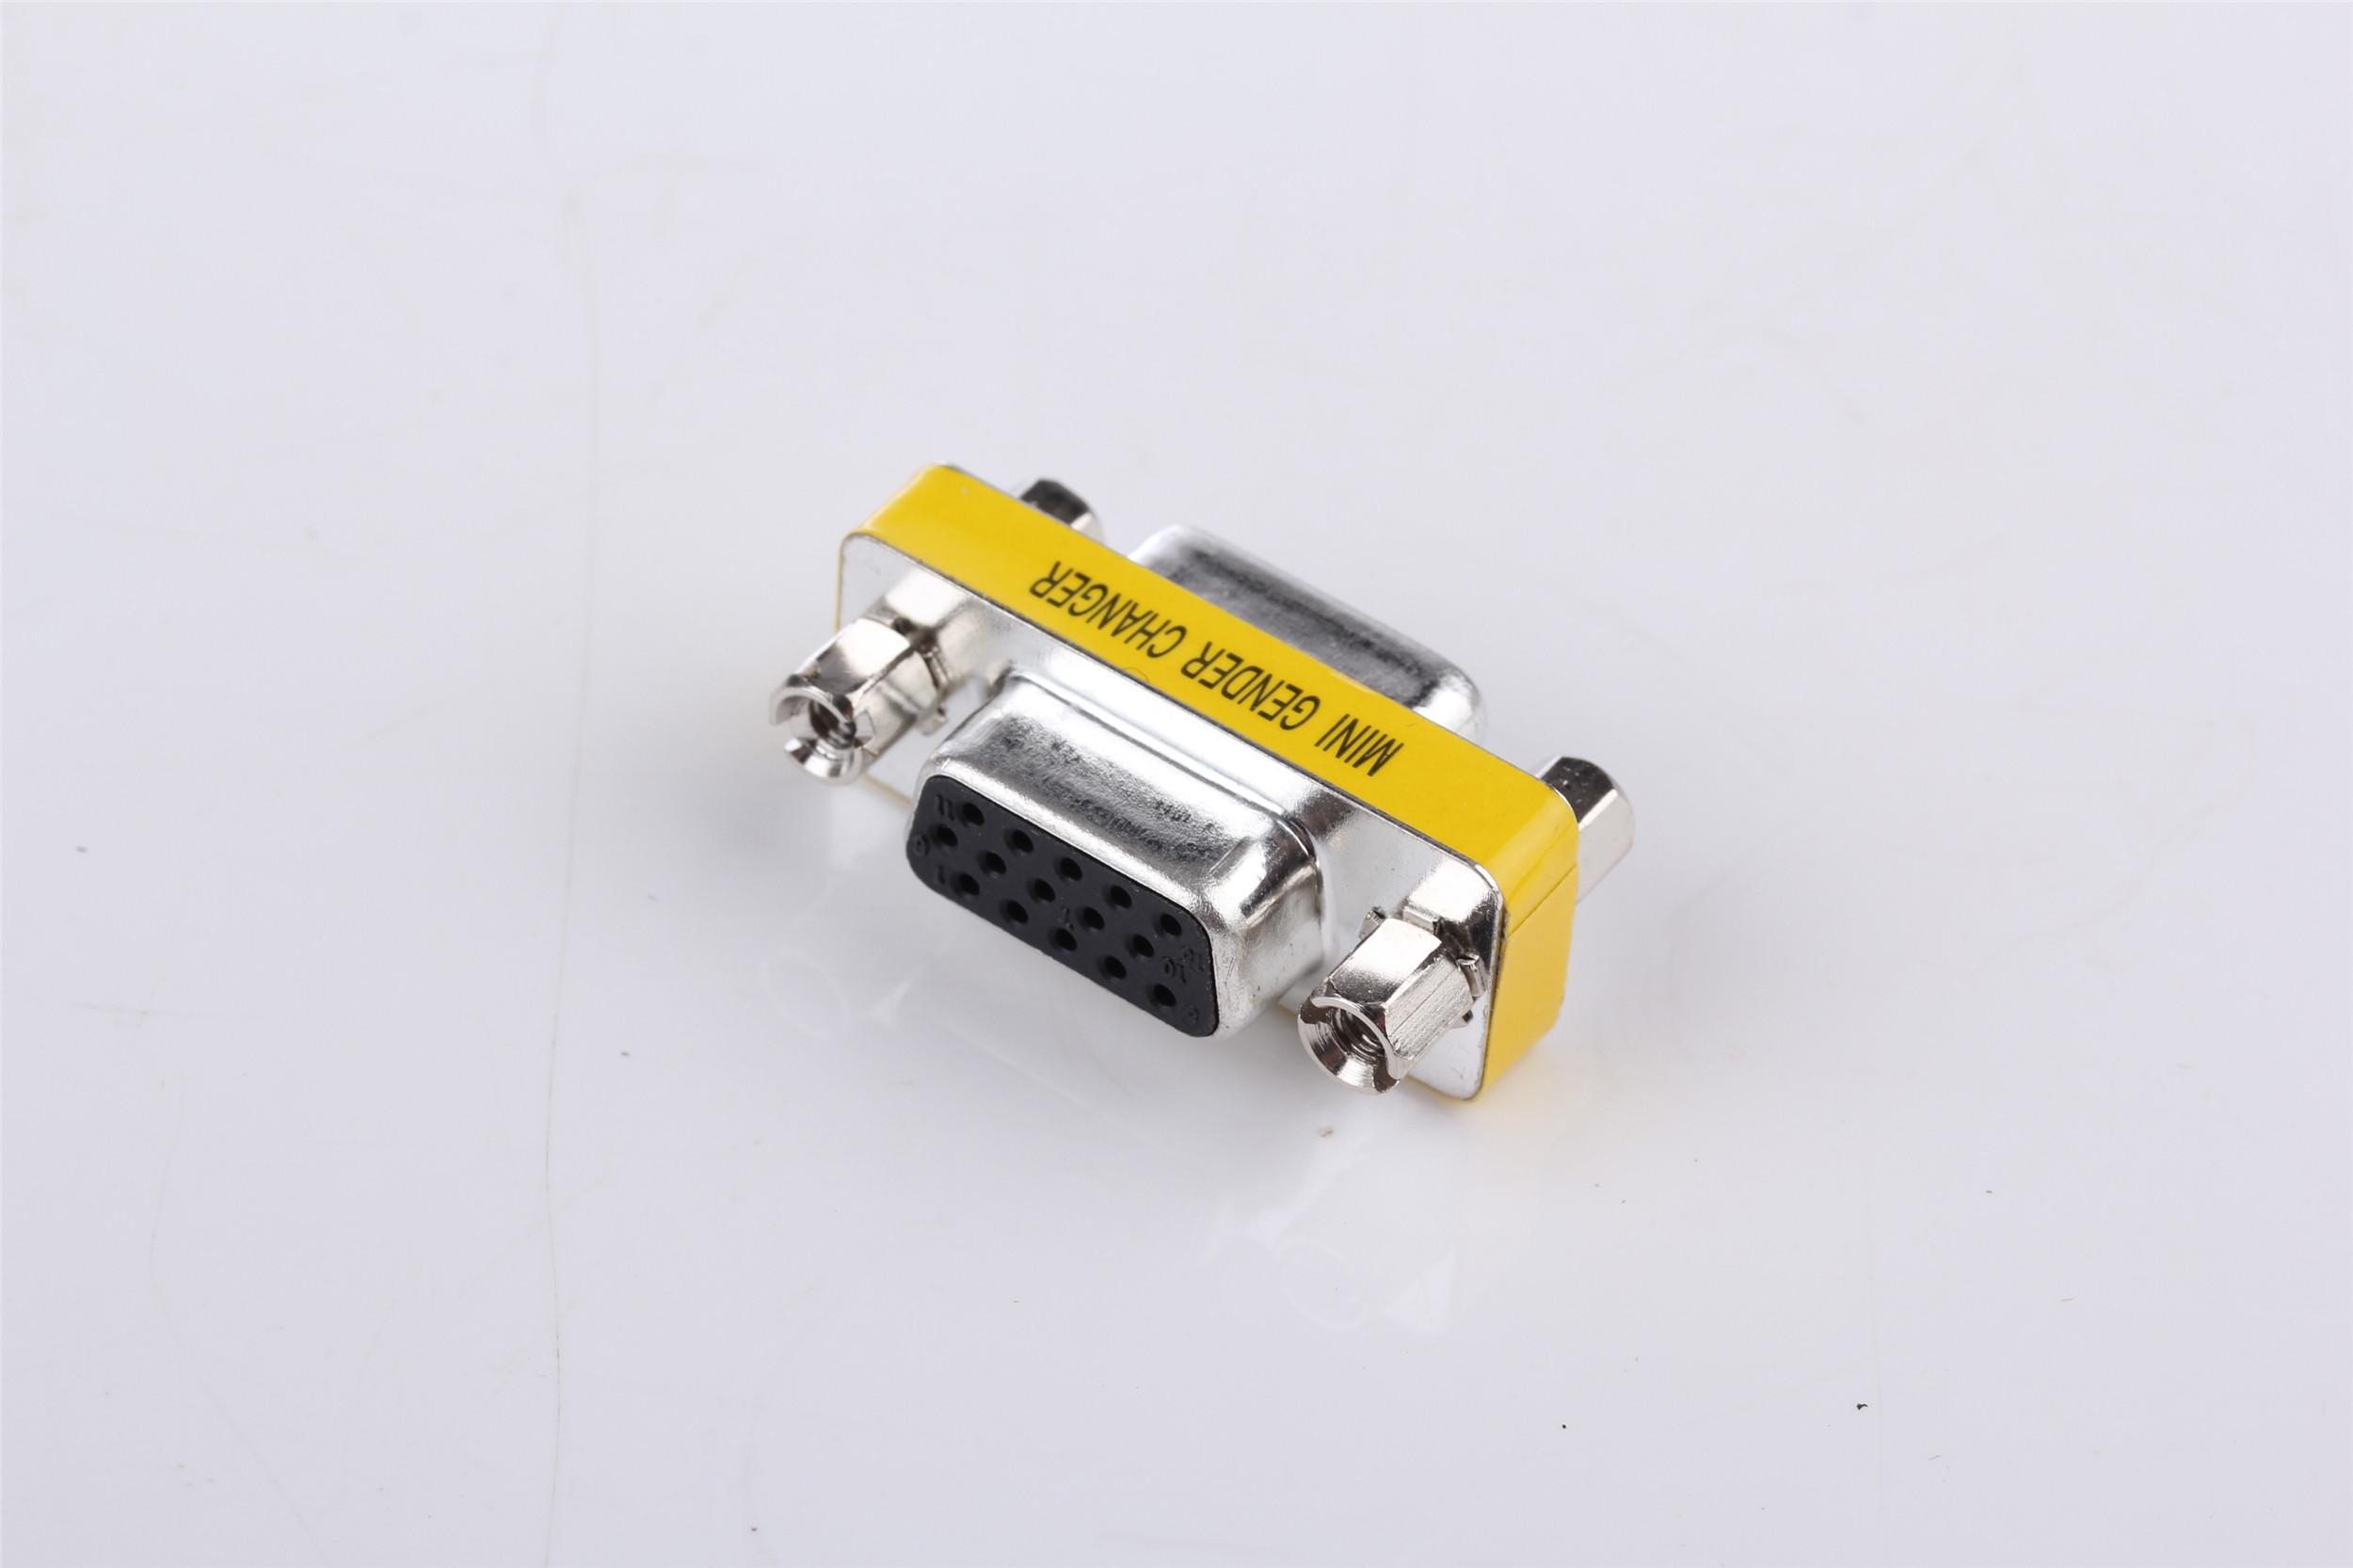 Провод NI Ipx Pilhas 15 Vga Computer peripheral adapter